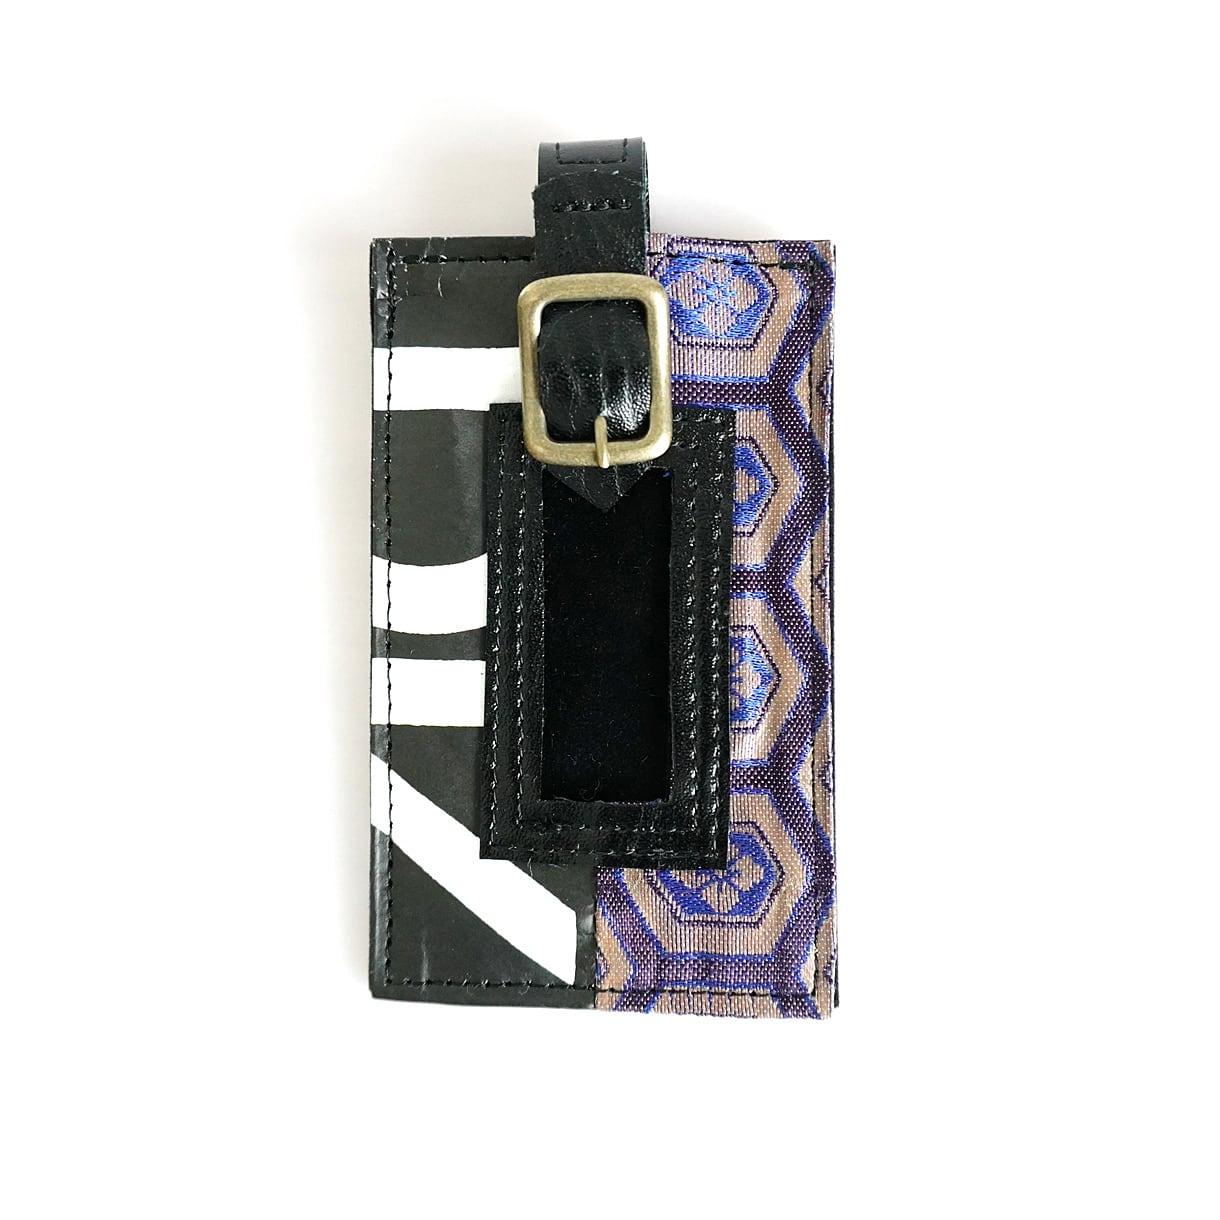 IC card case / ICG-0012